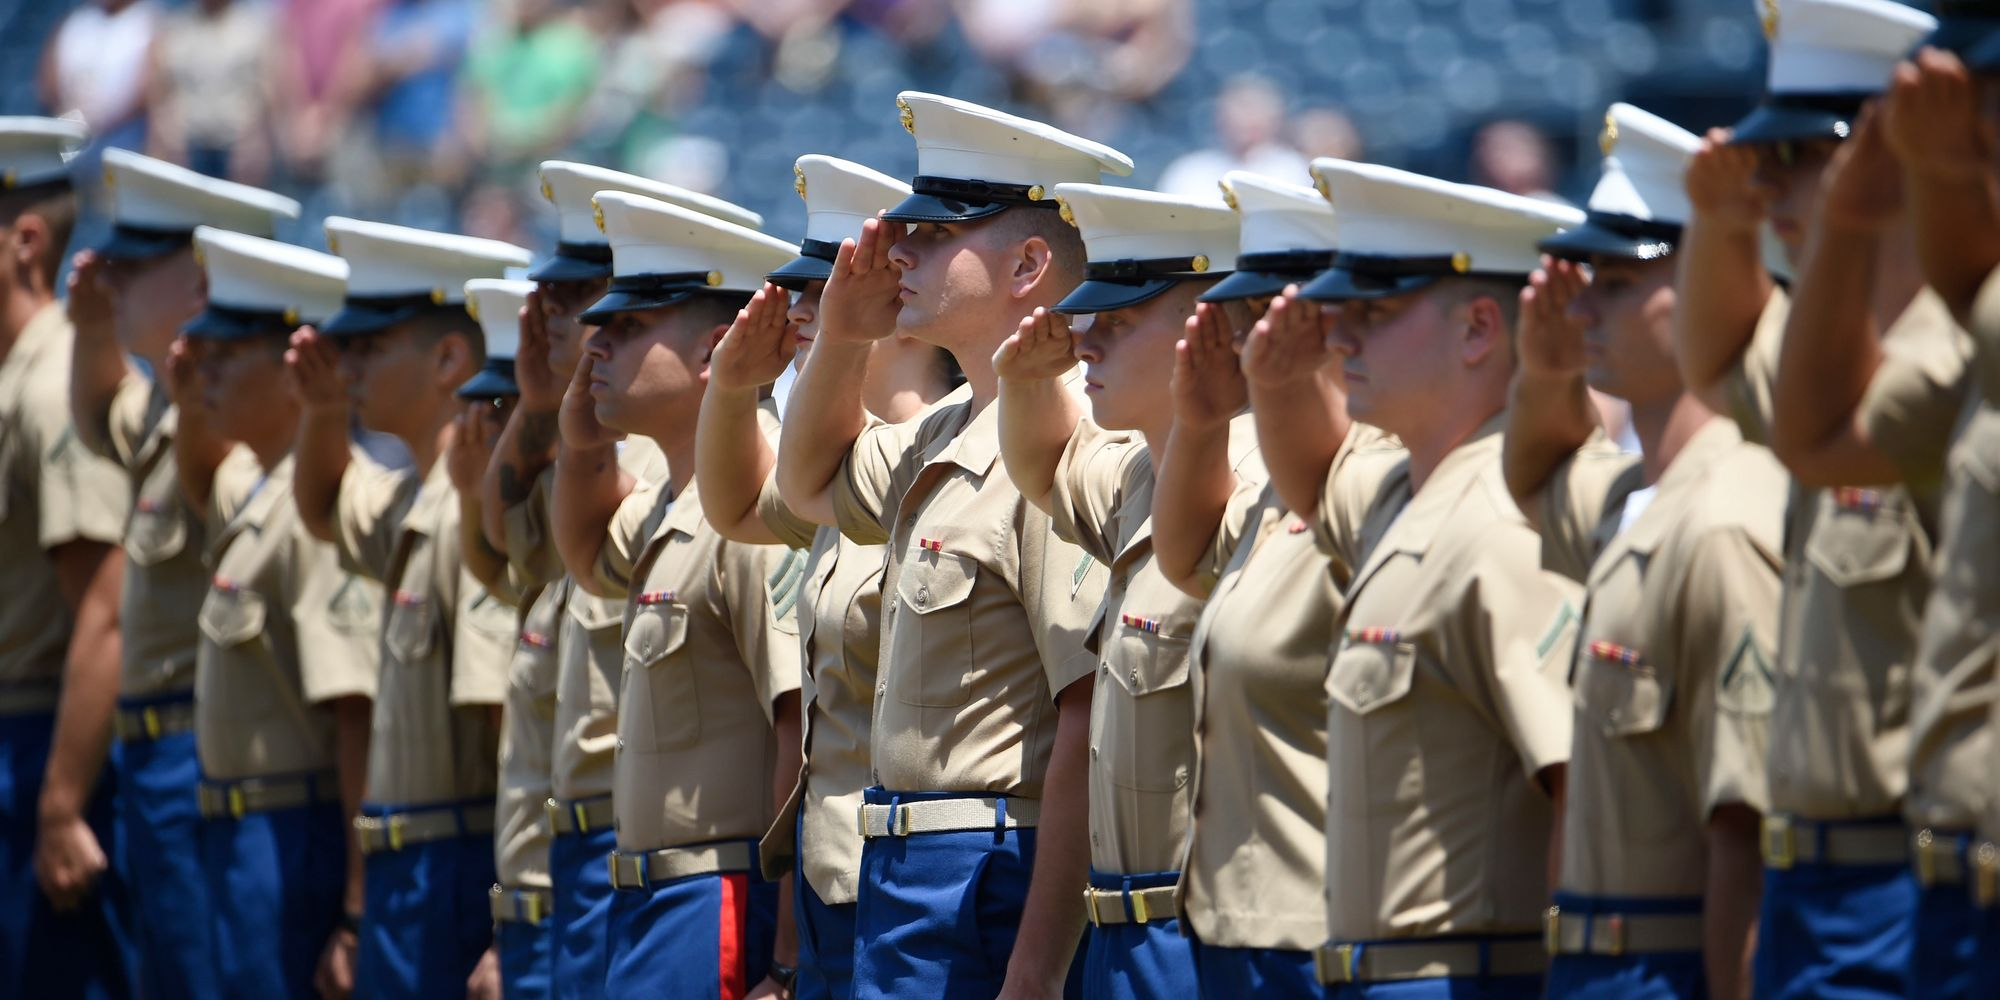 93 Female Marines Write Letter Urging Service To Address Rampant Misogyny